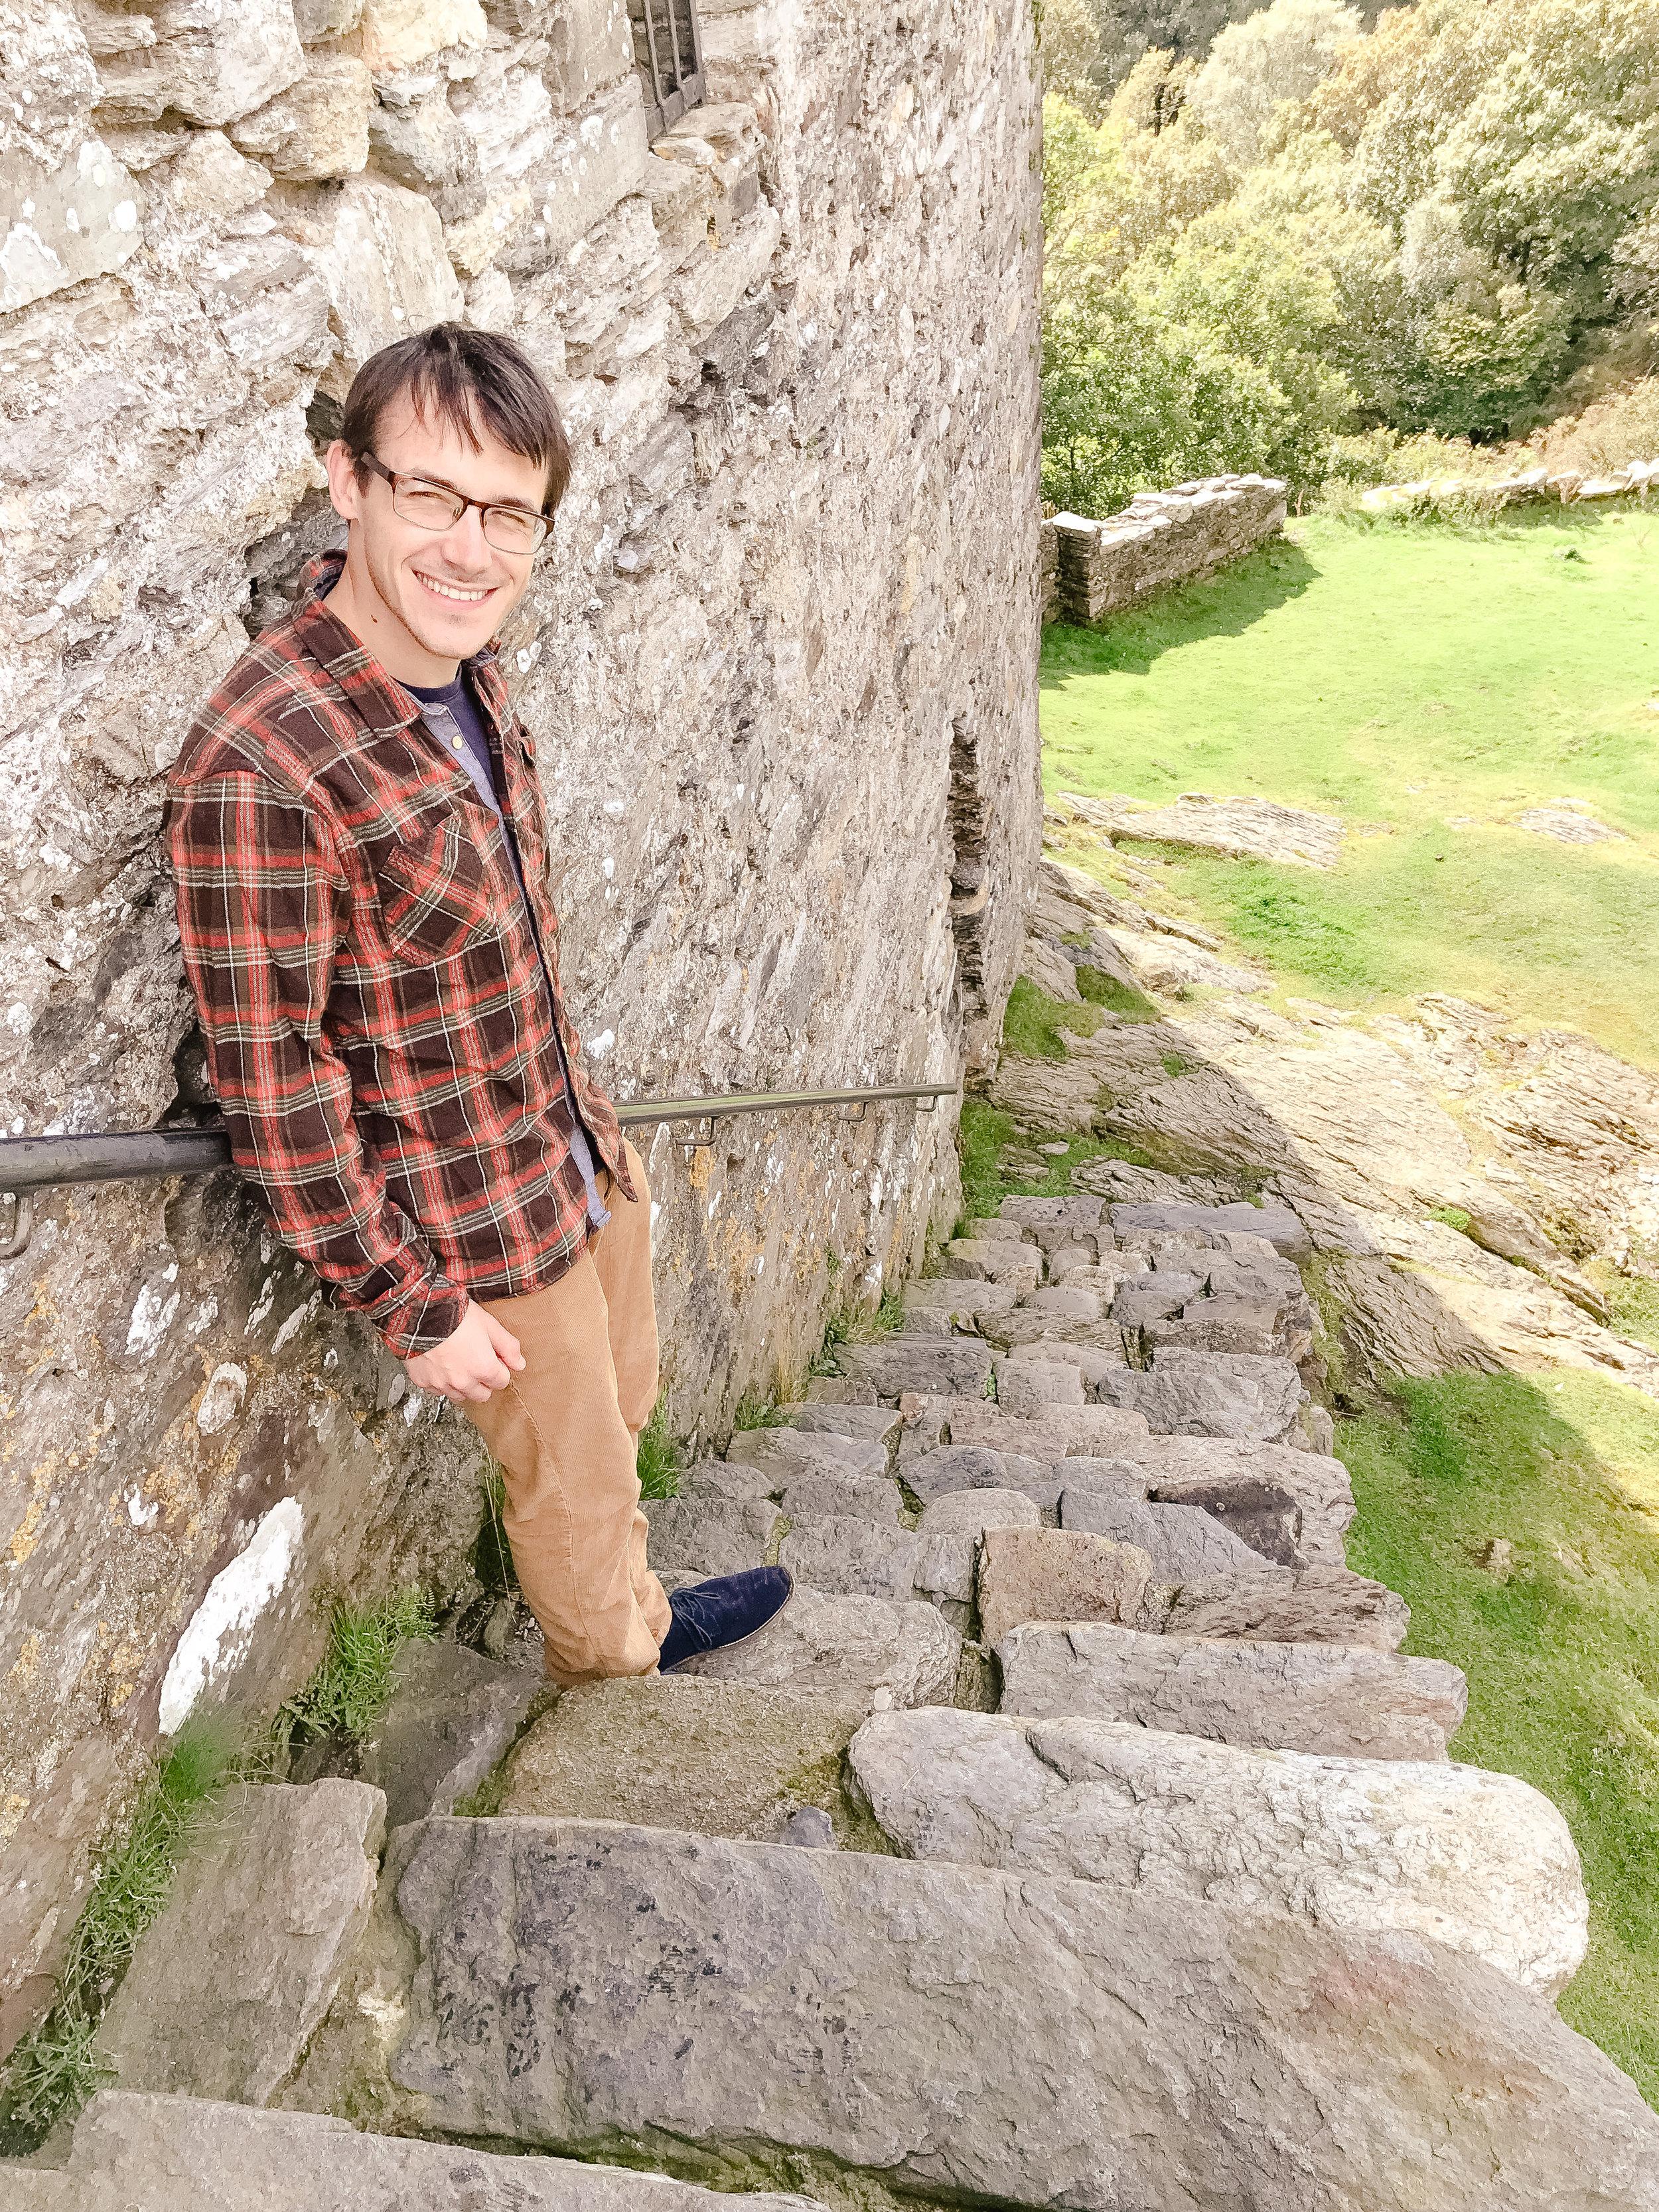 dolwyddelan-castle-wales